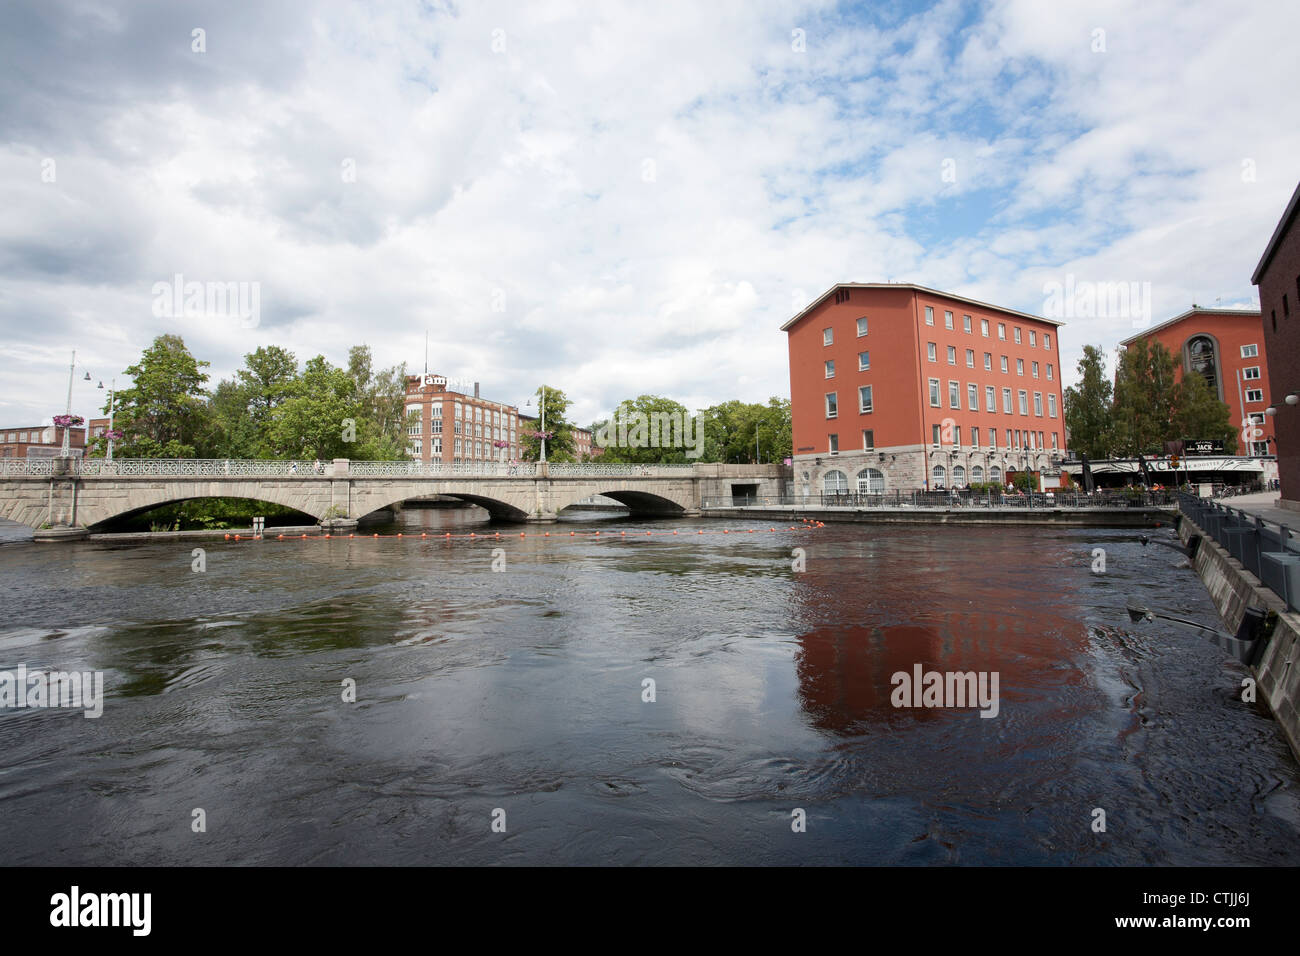 Cityscape, Tampere Finland - Stock Image